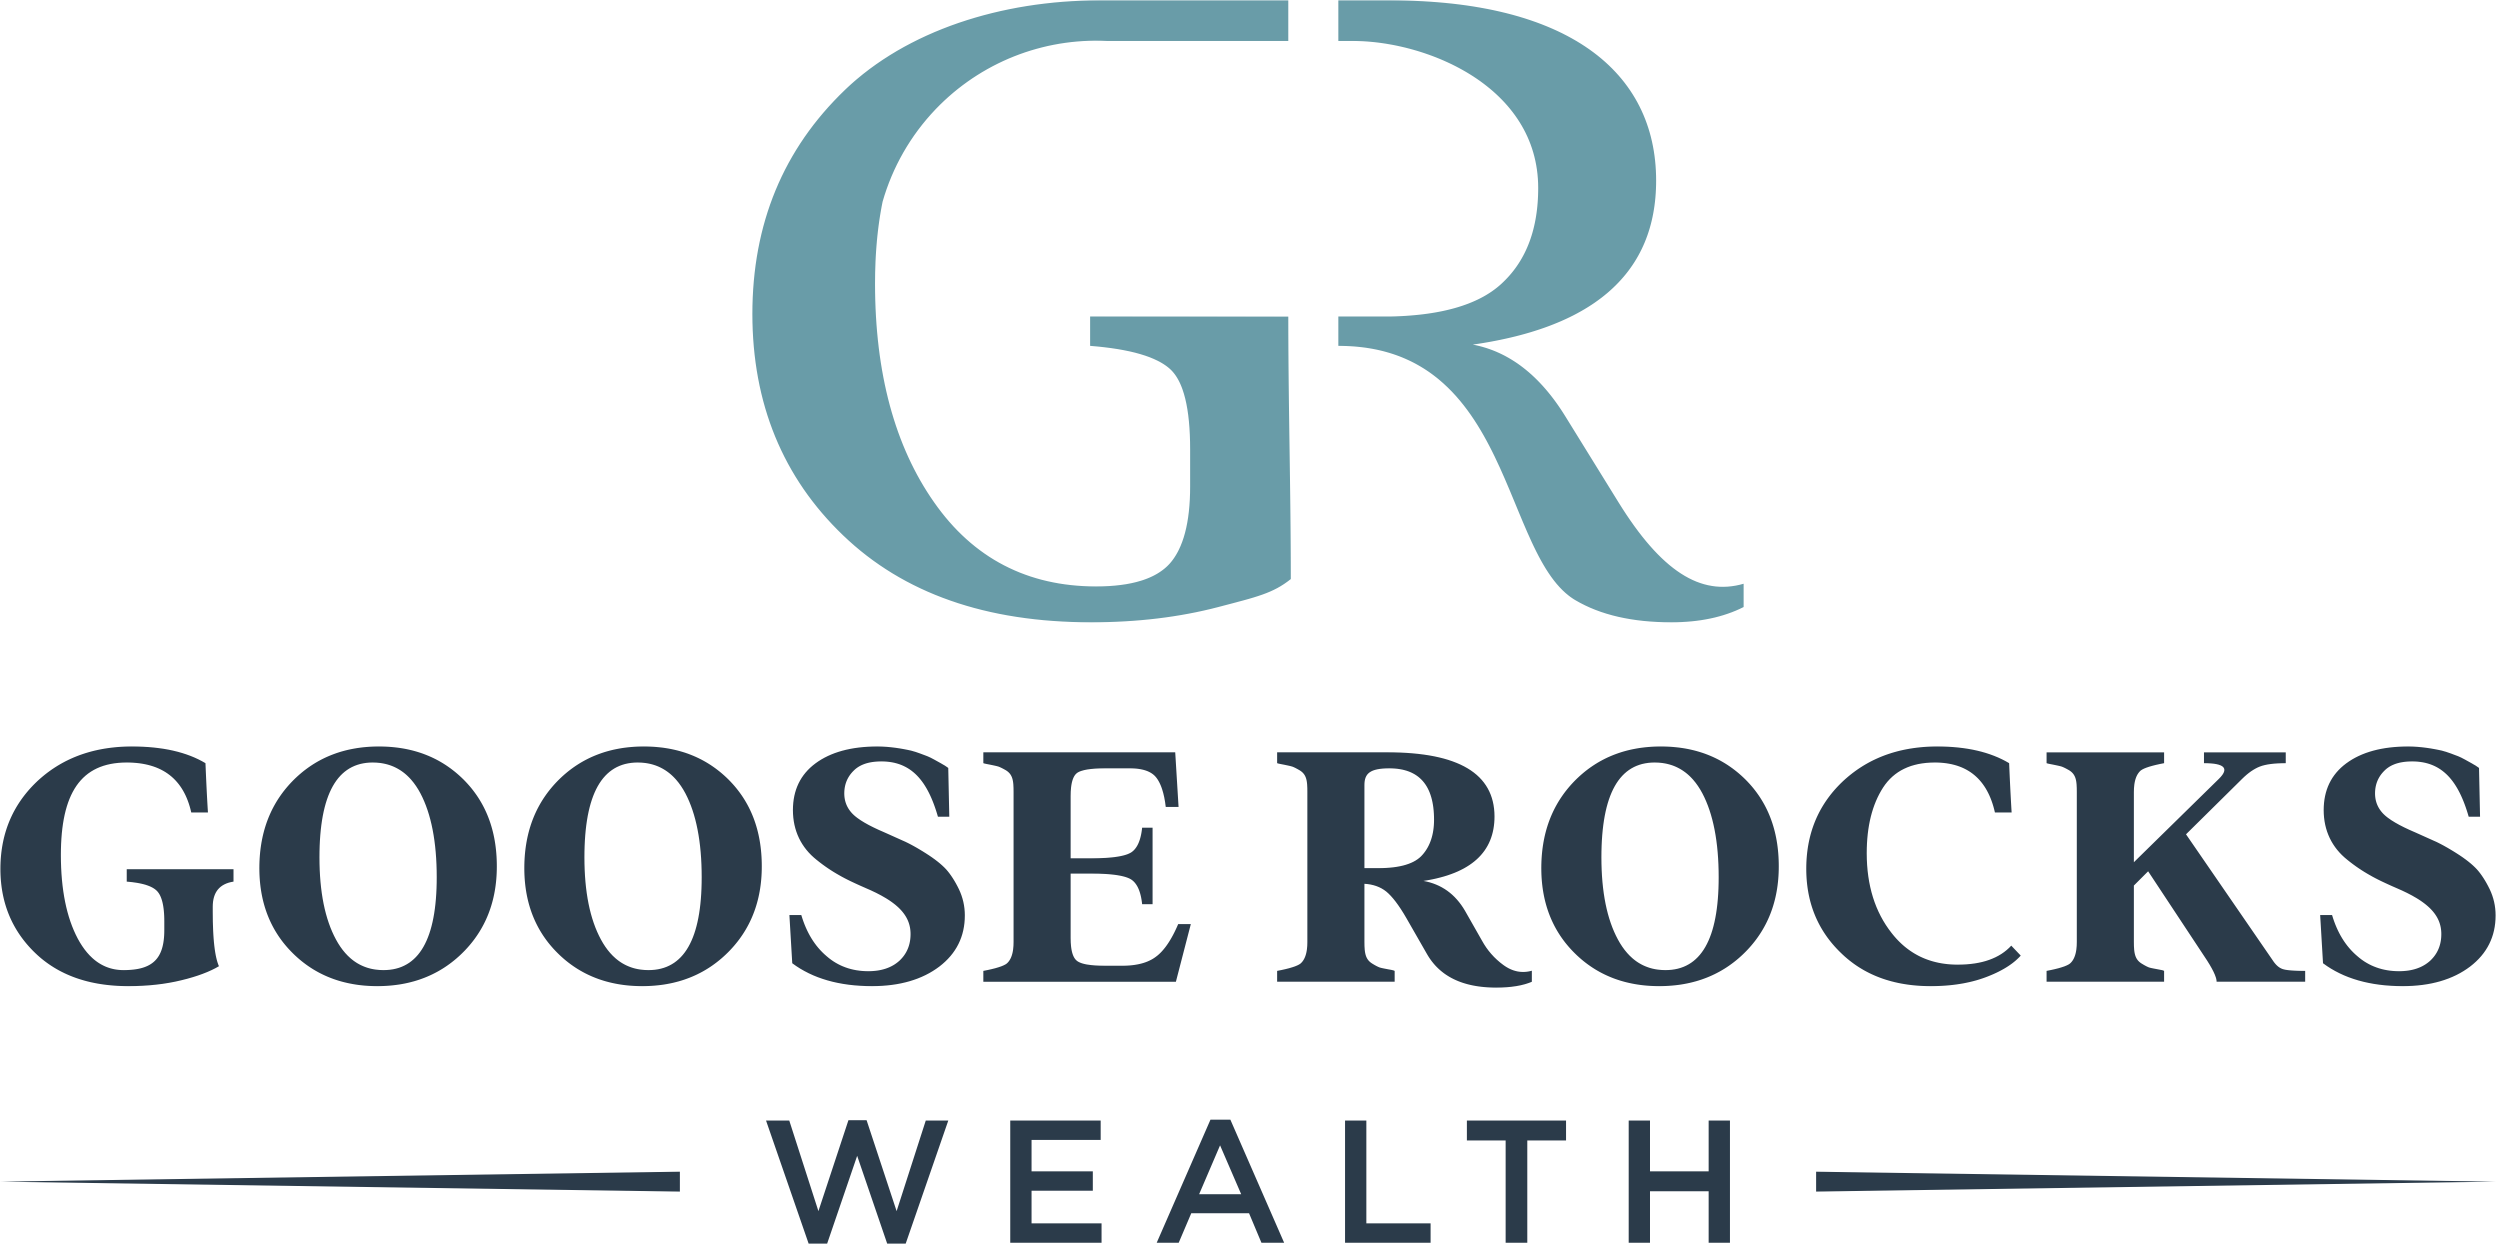 Goose Rocks Wealth